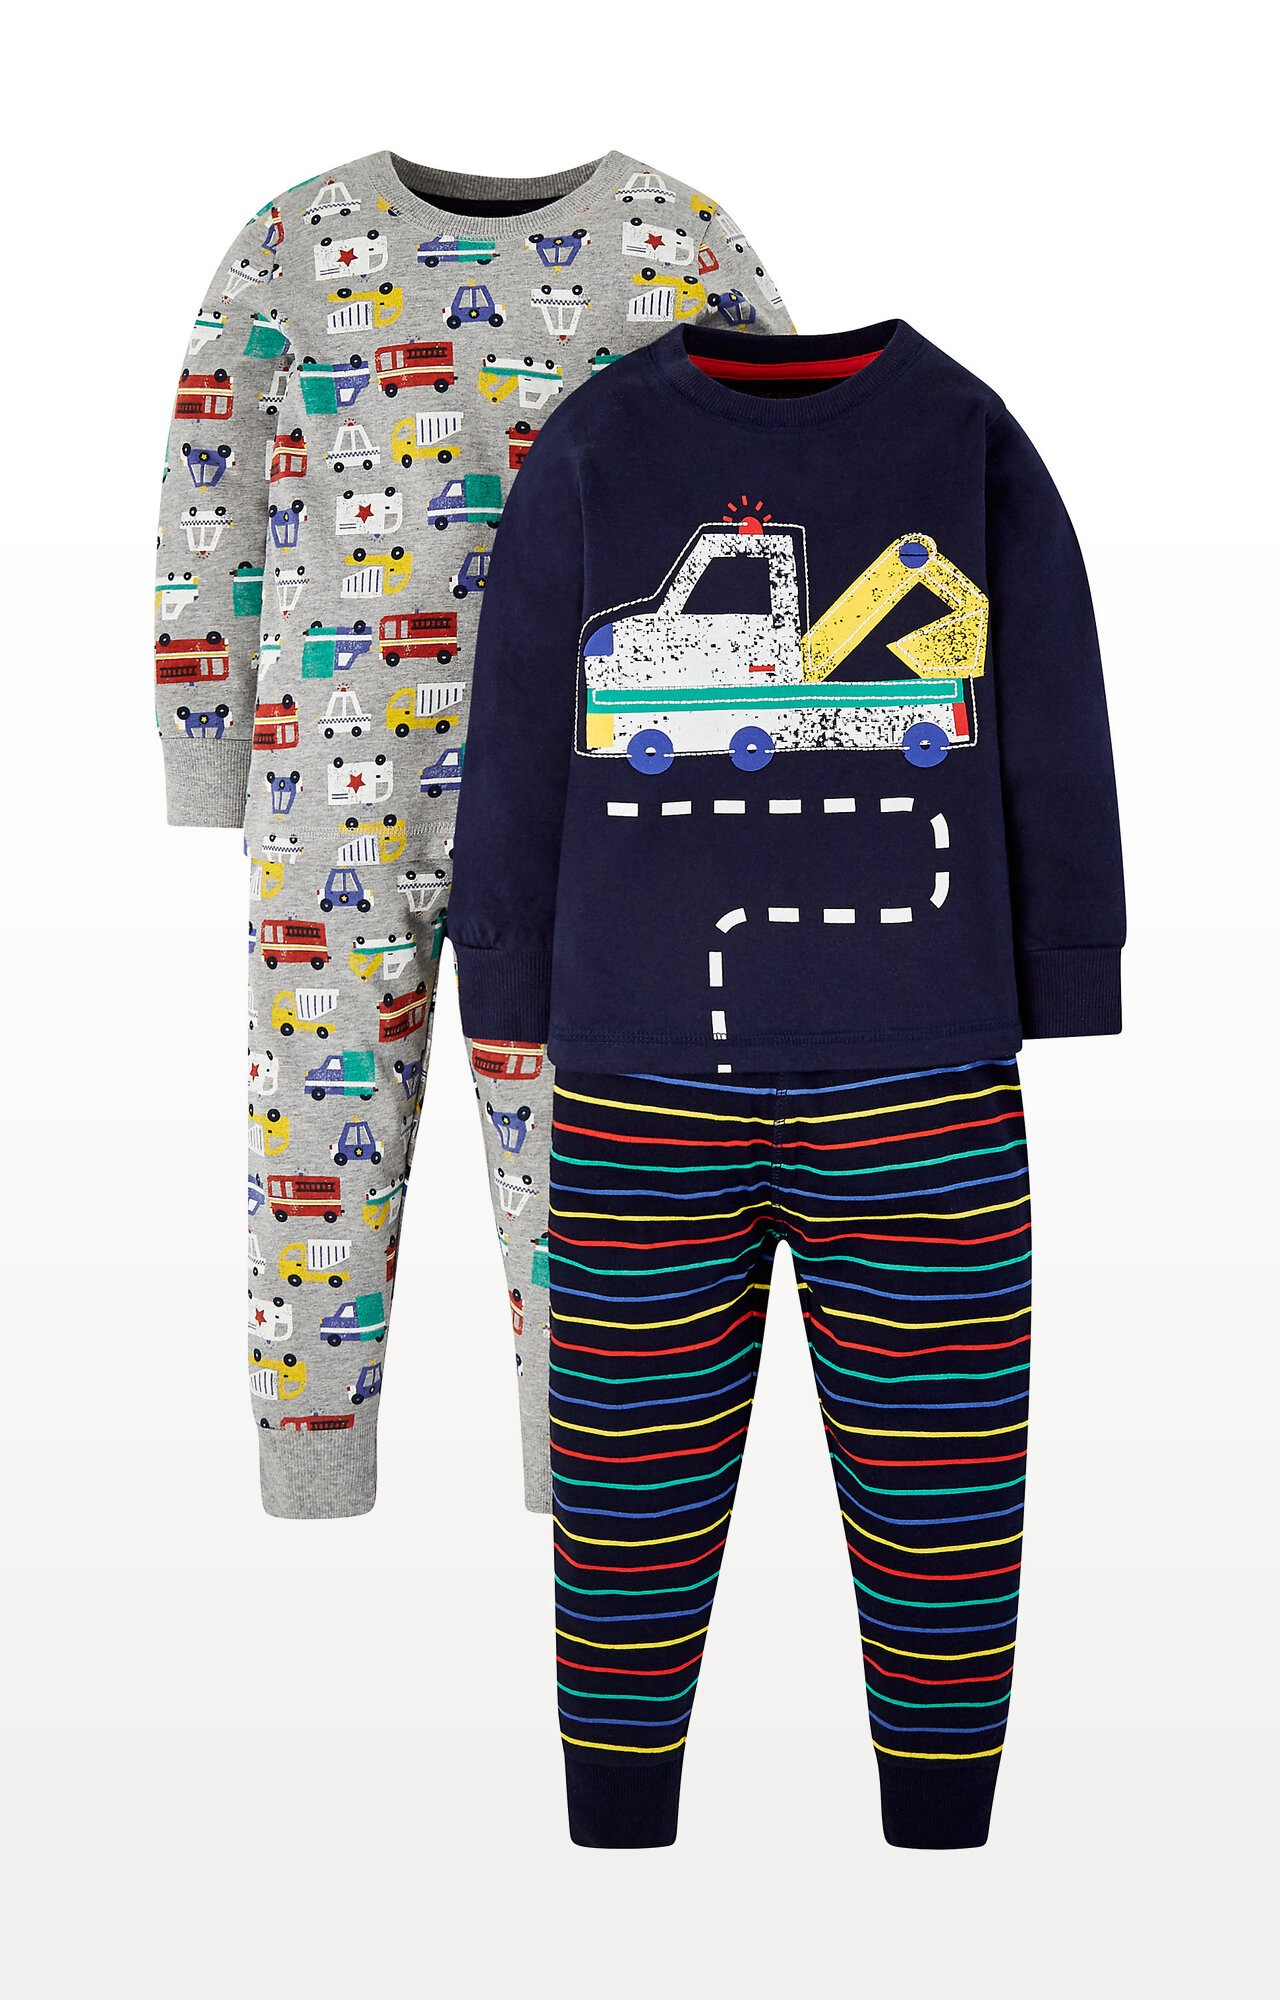 Mothercare | Grey and Navy Construction Vehicle Pyjamas